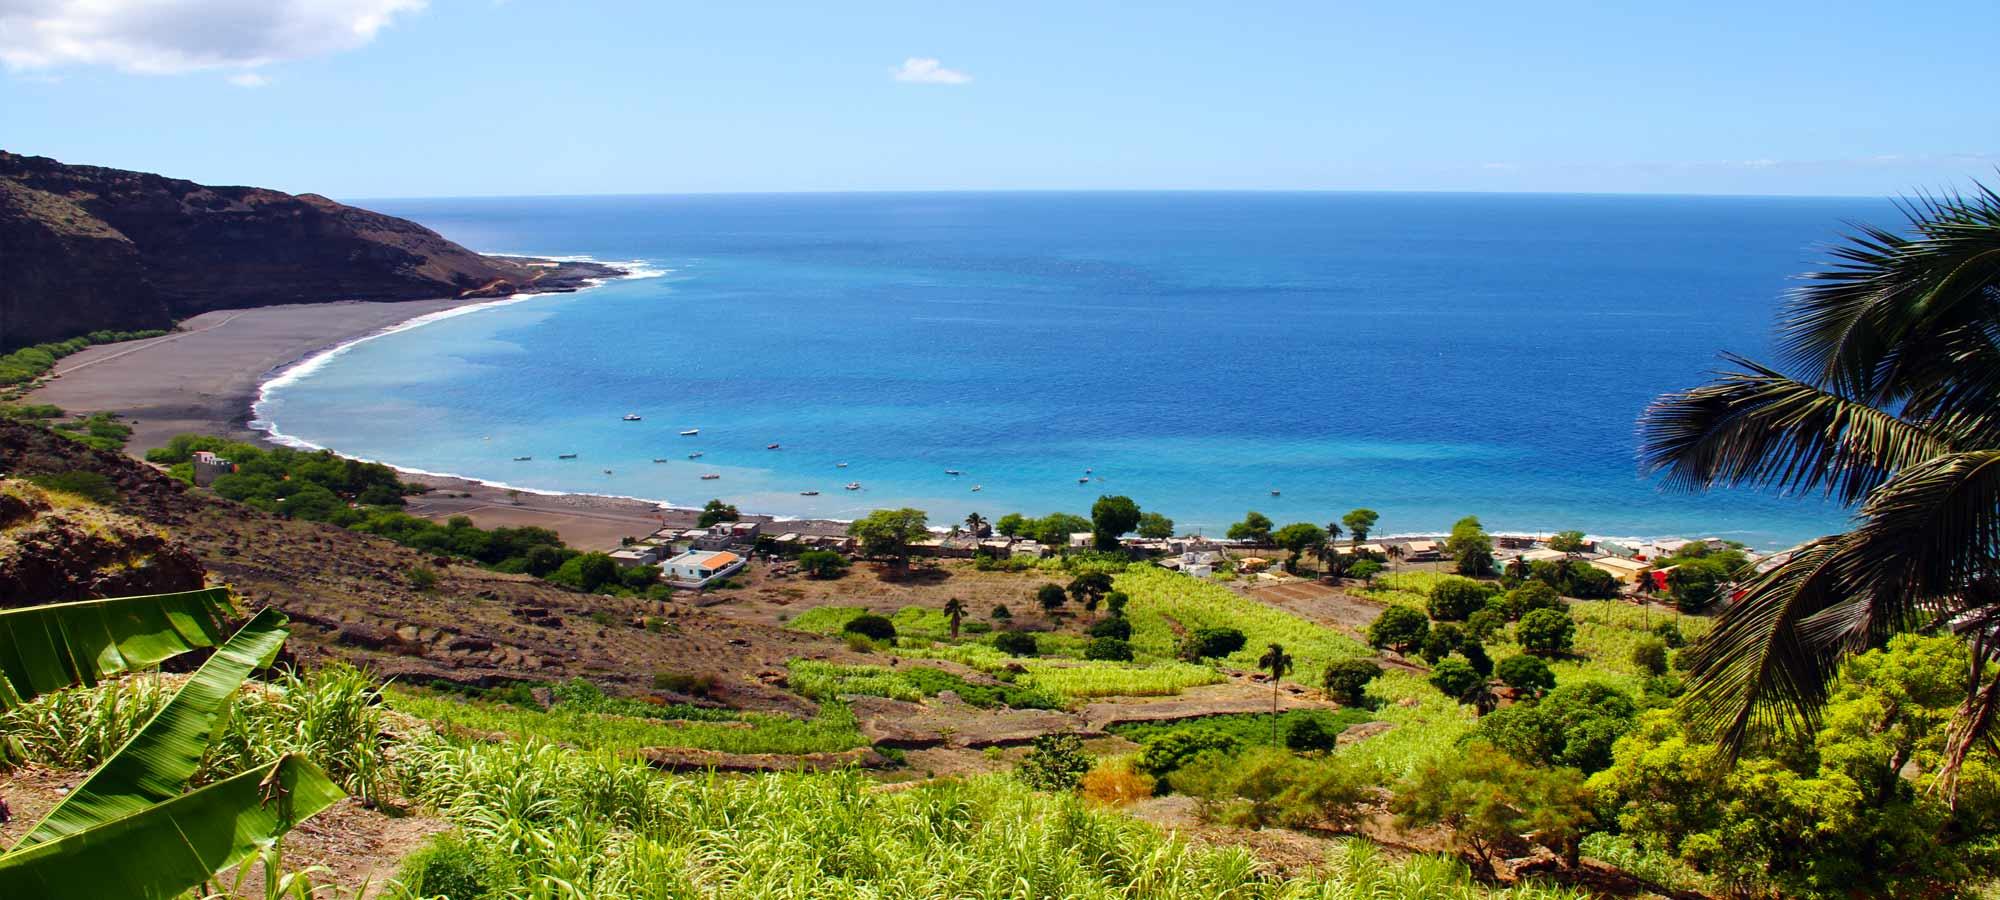 Kap Verde Turvallisuus